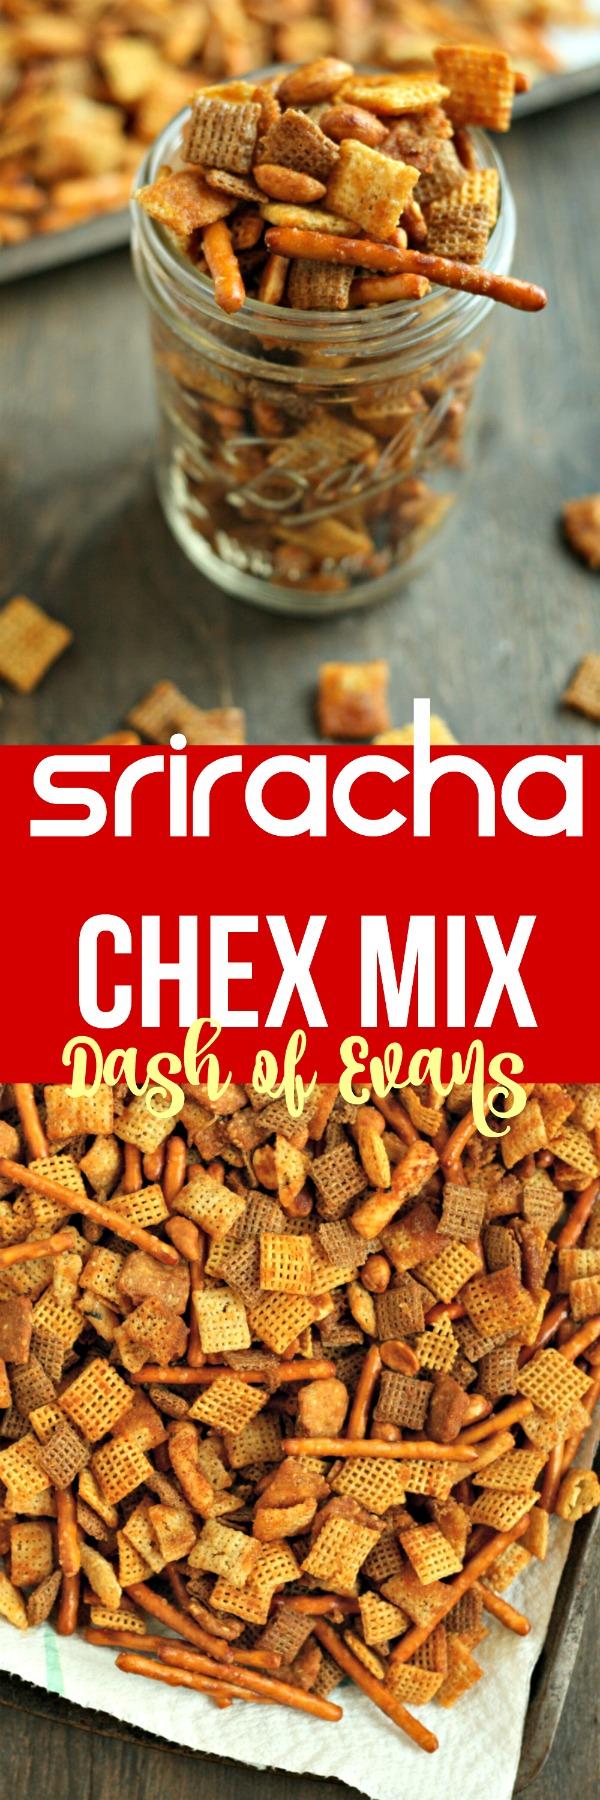 Perfect Road Trip Snack: Sriracha Chex Mix! - Dash Of Evans